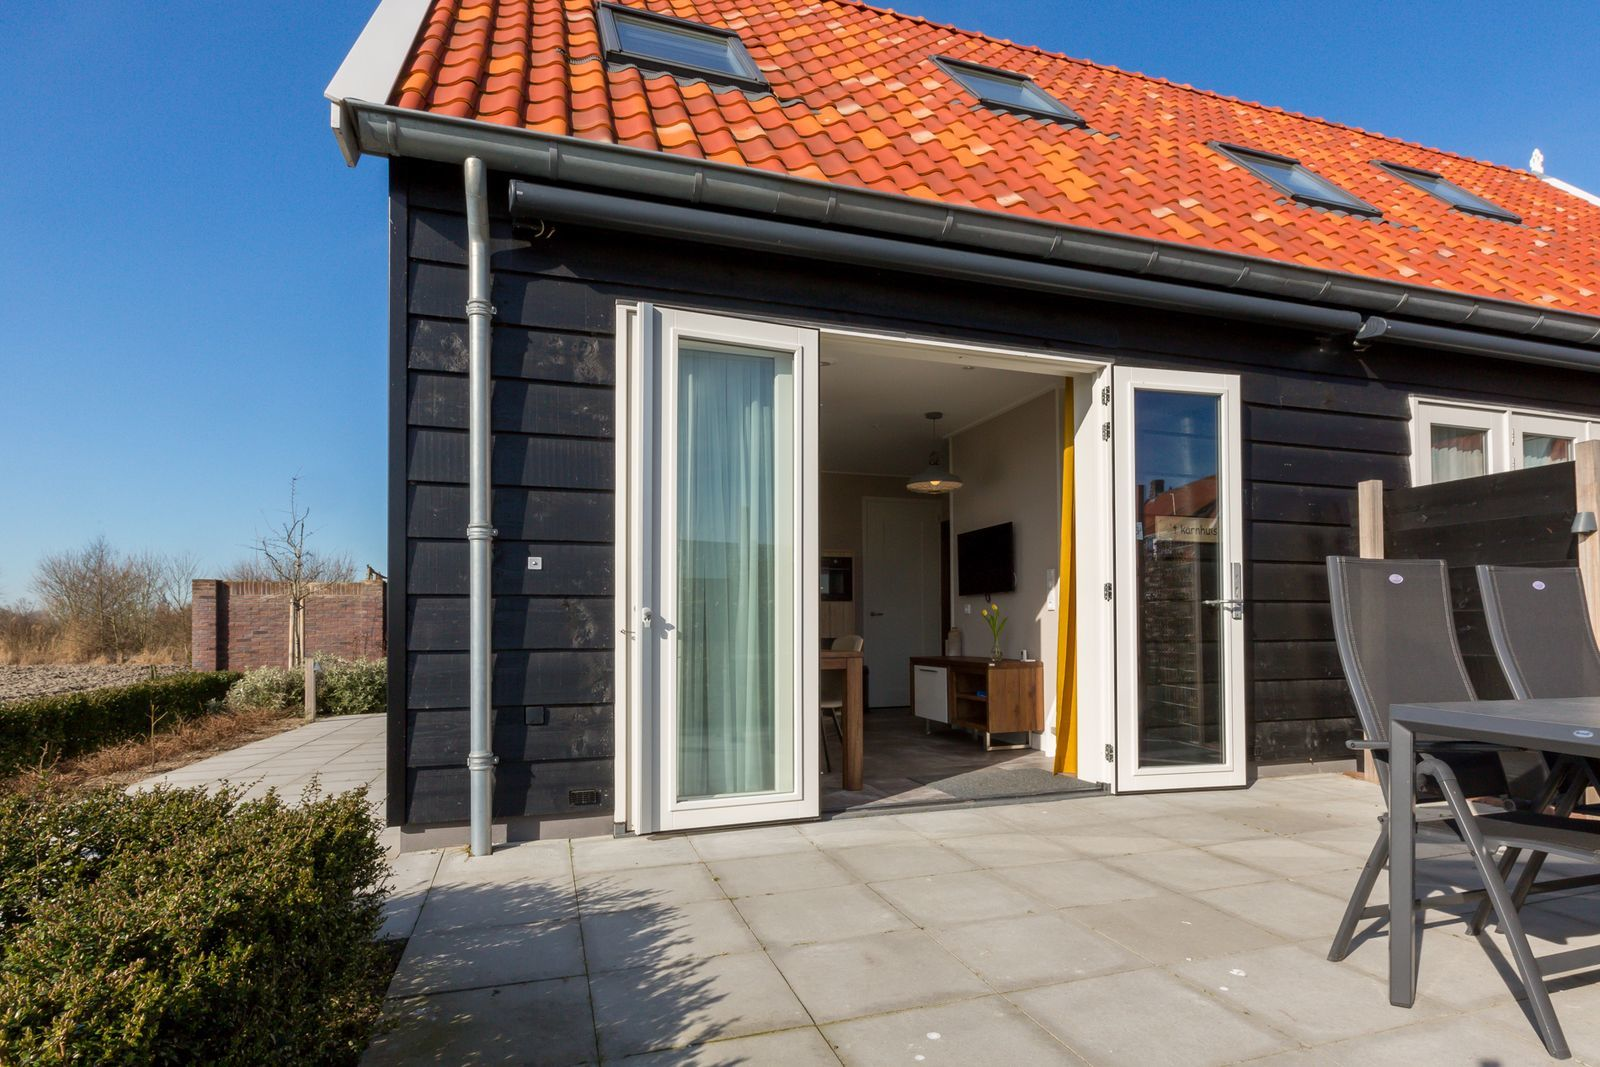 "Ferienwohnung - Noordweg 56a | Oostkapelle ""Comfort 3 Personen"""